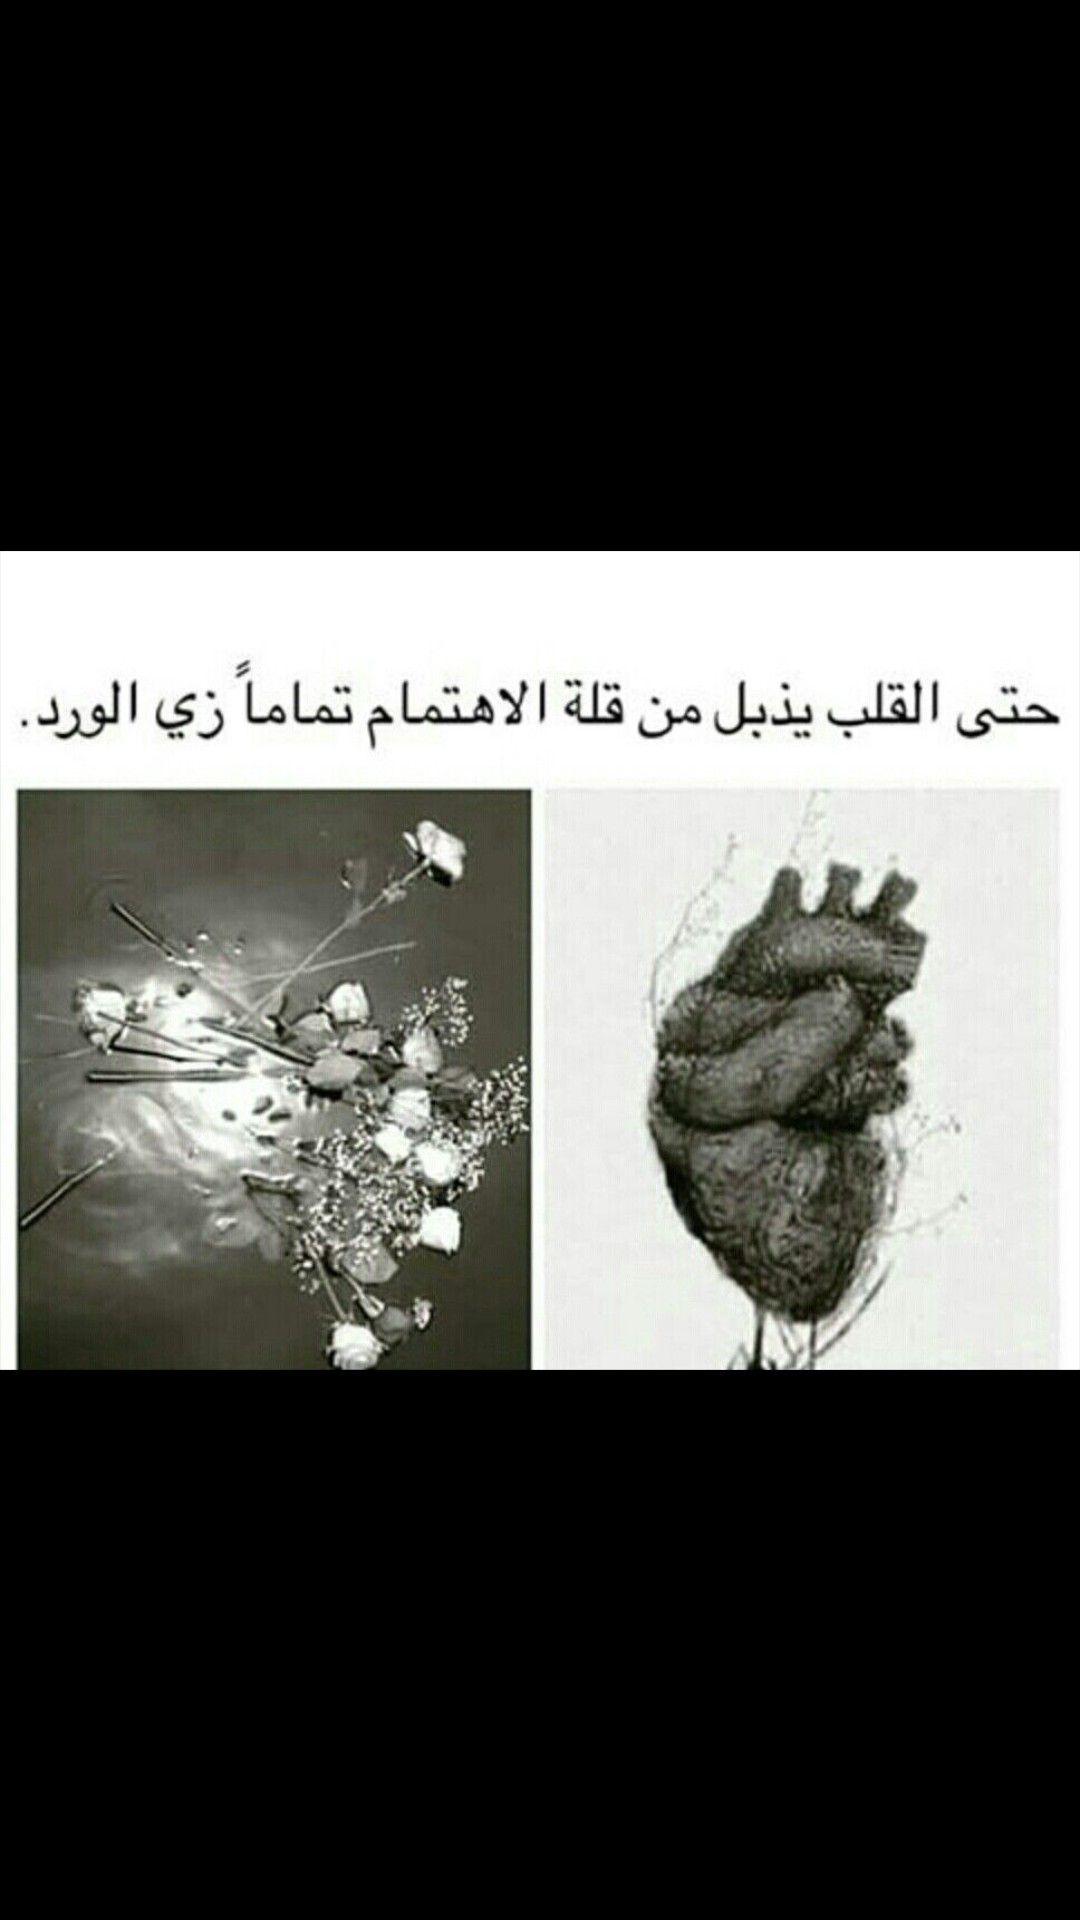 Pin By Rim Chahine On كلام Arabic Words Arabic Quotes Qoutes